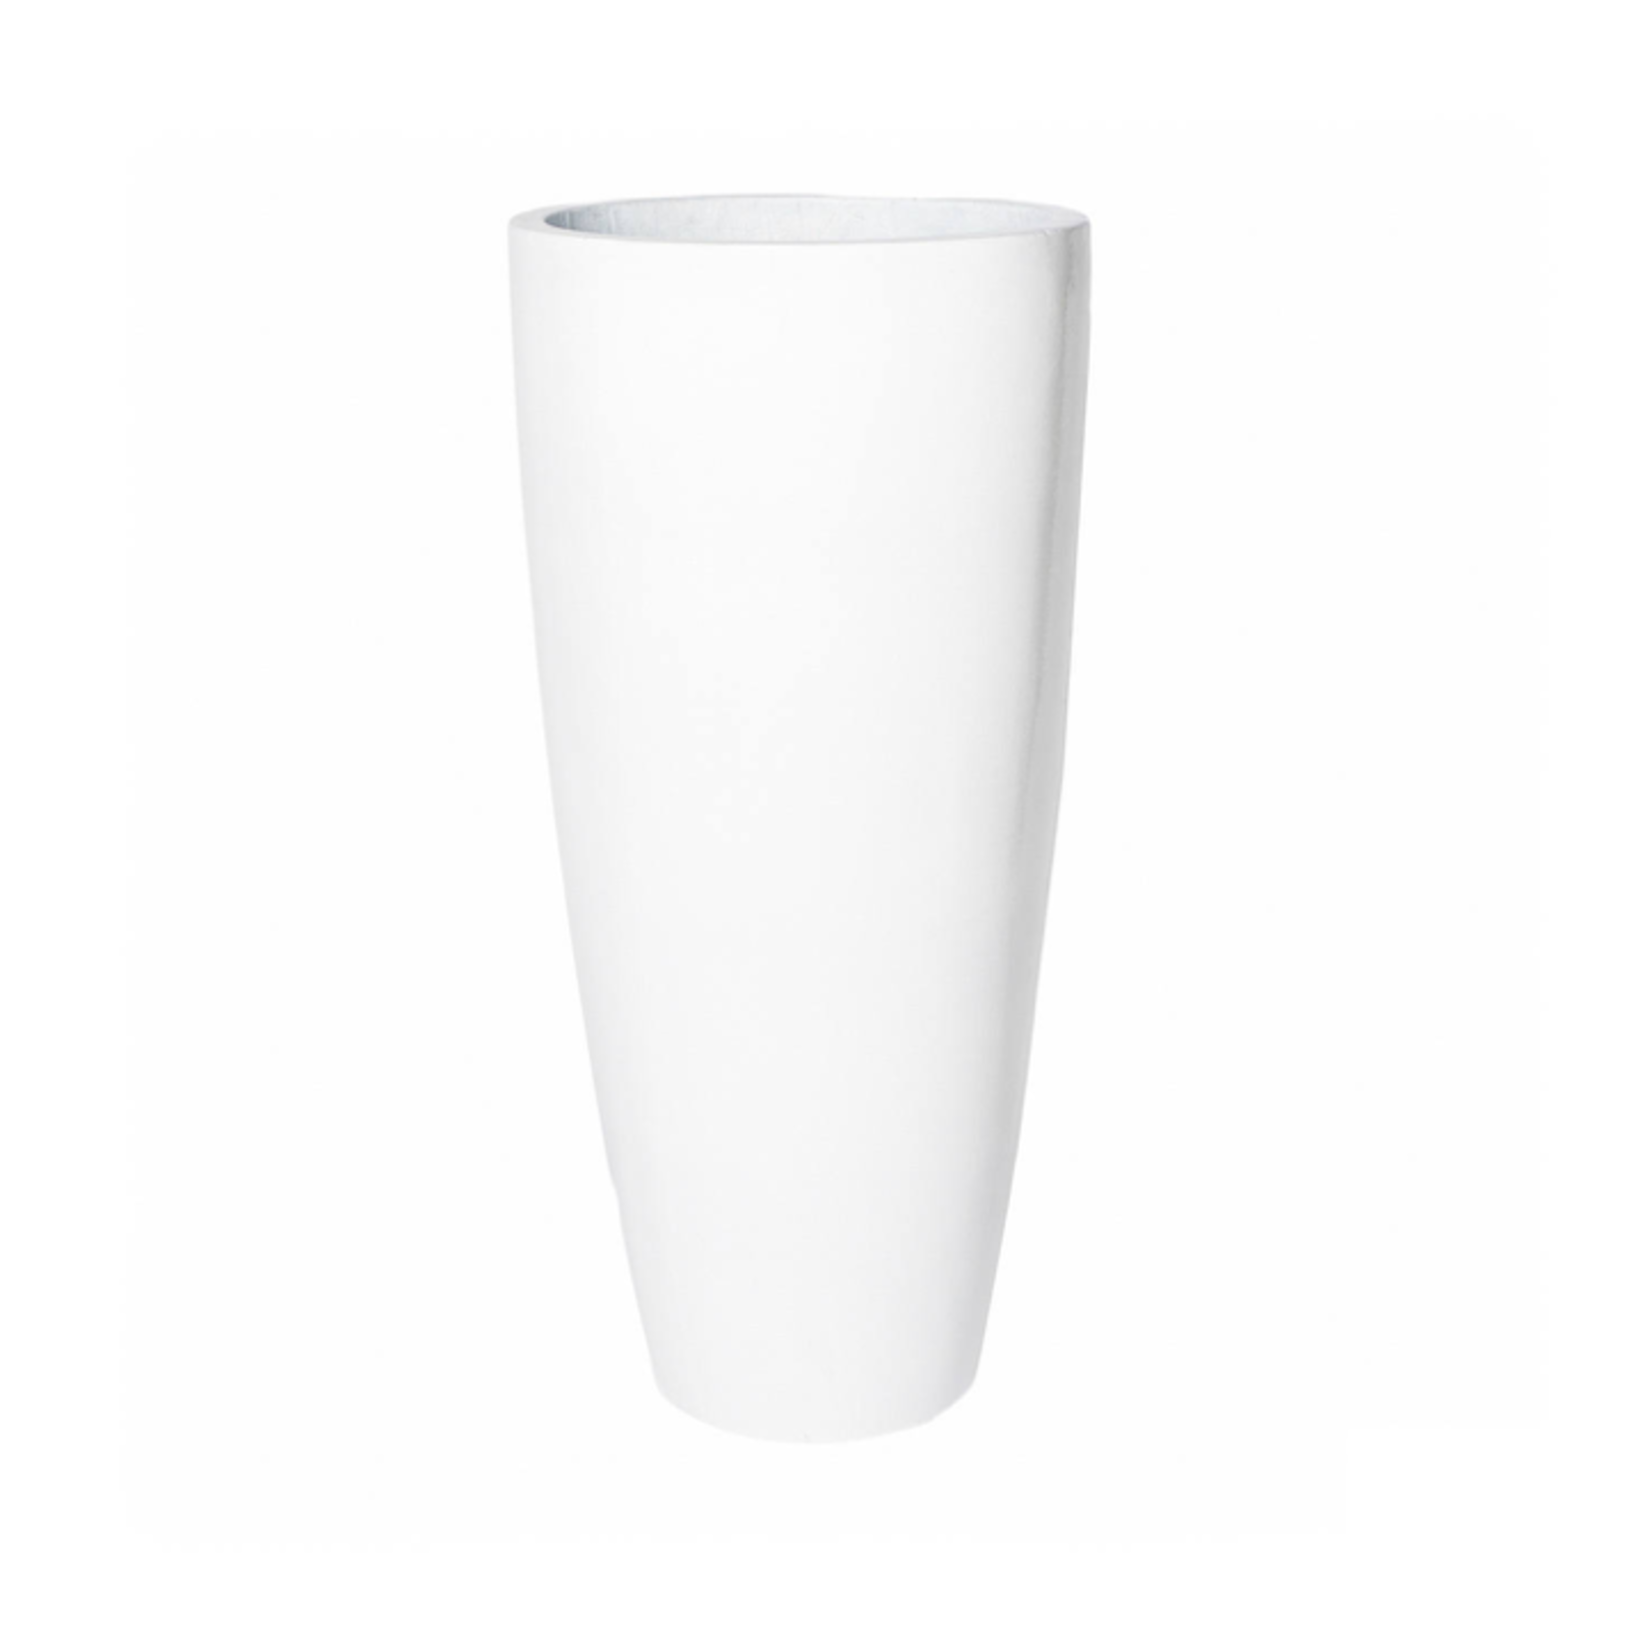 "39.5"" X 18""D TAPER CYLINDER  GLOSSY WHITE POLY STONE/FIBERGLASS PLANTER"